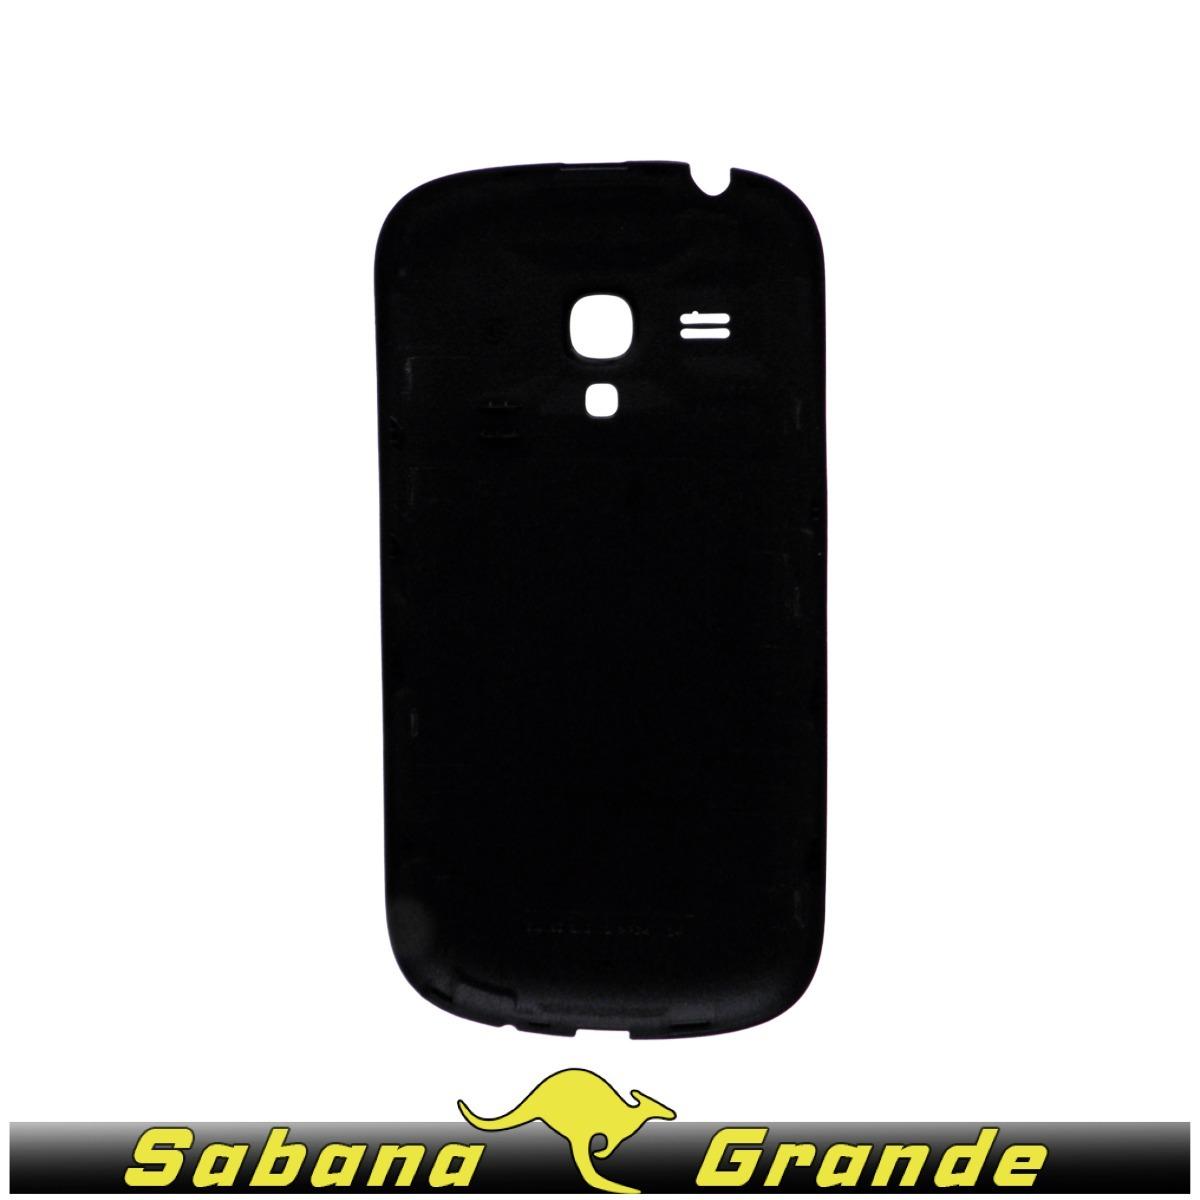 c199d05f304 Tapa Trasera Samsung Galaxy S3 Mini I8190 - Bs. 11.900,00 en Mercado ...